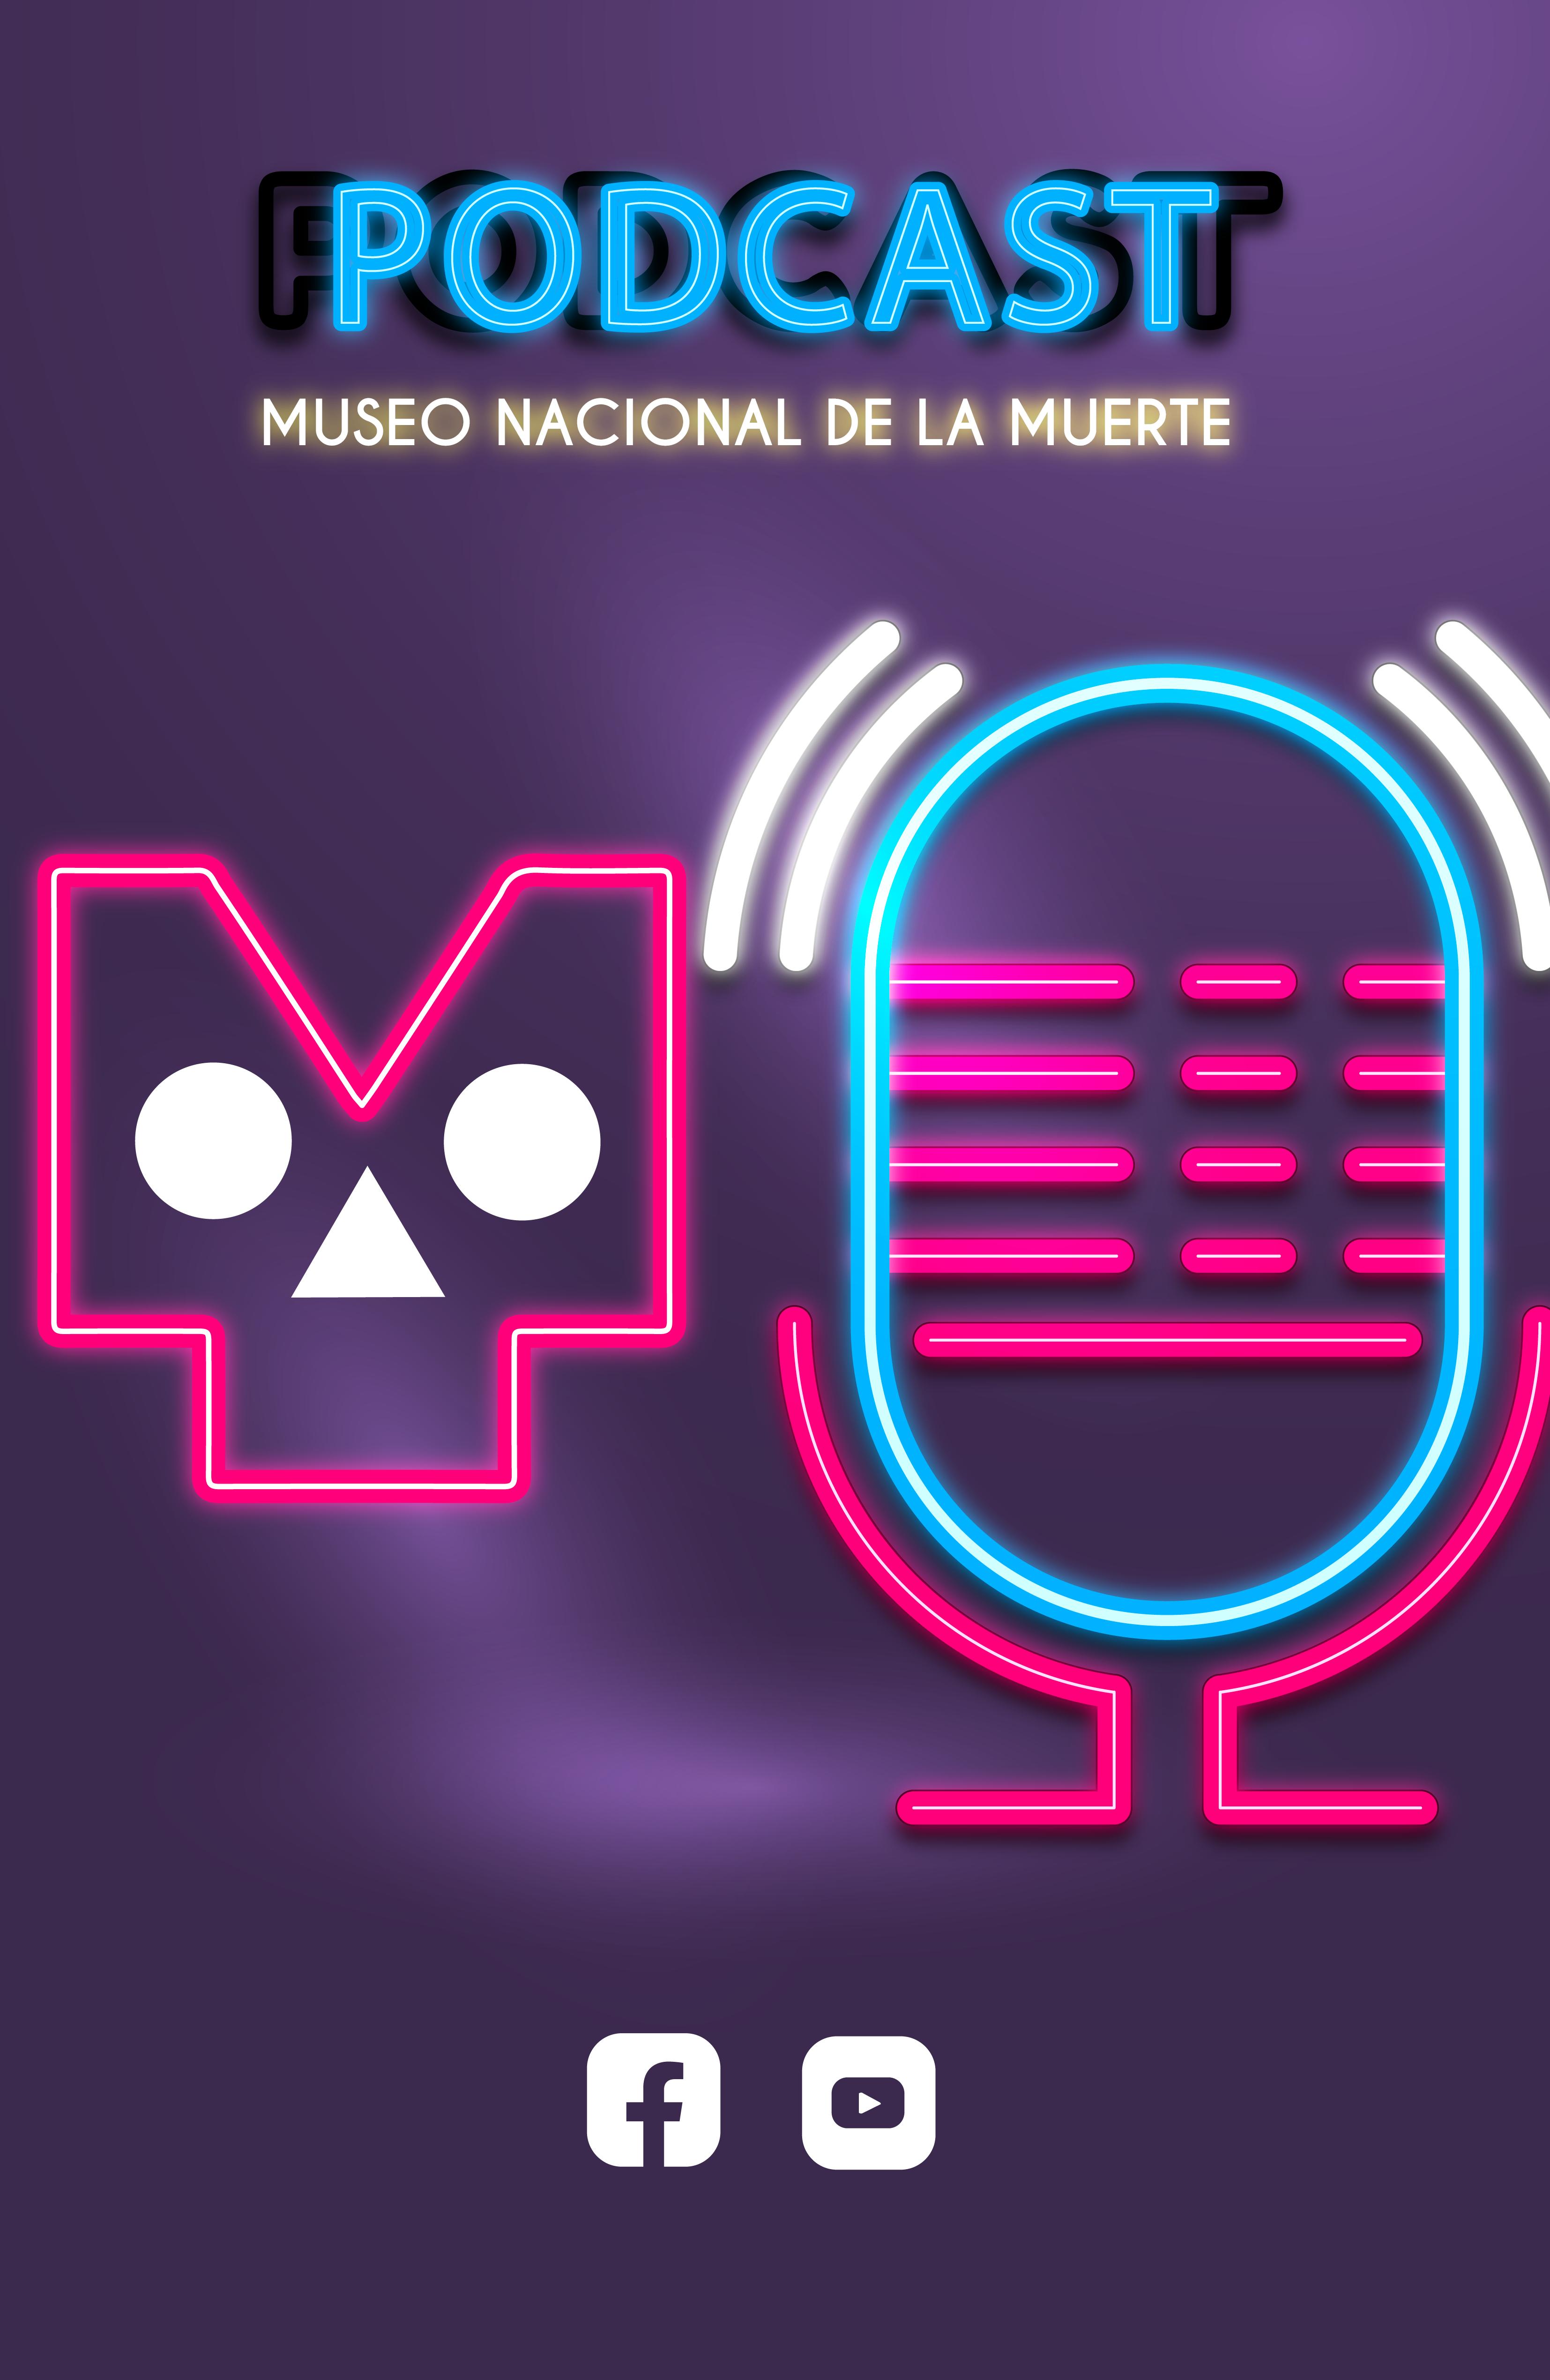 Podcast Museo Nacional de la Muerte